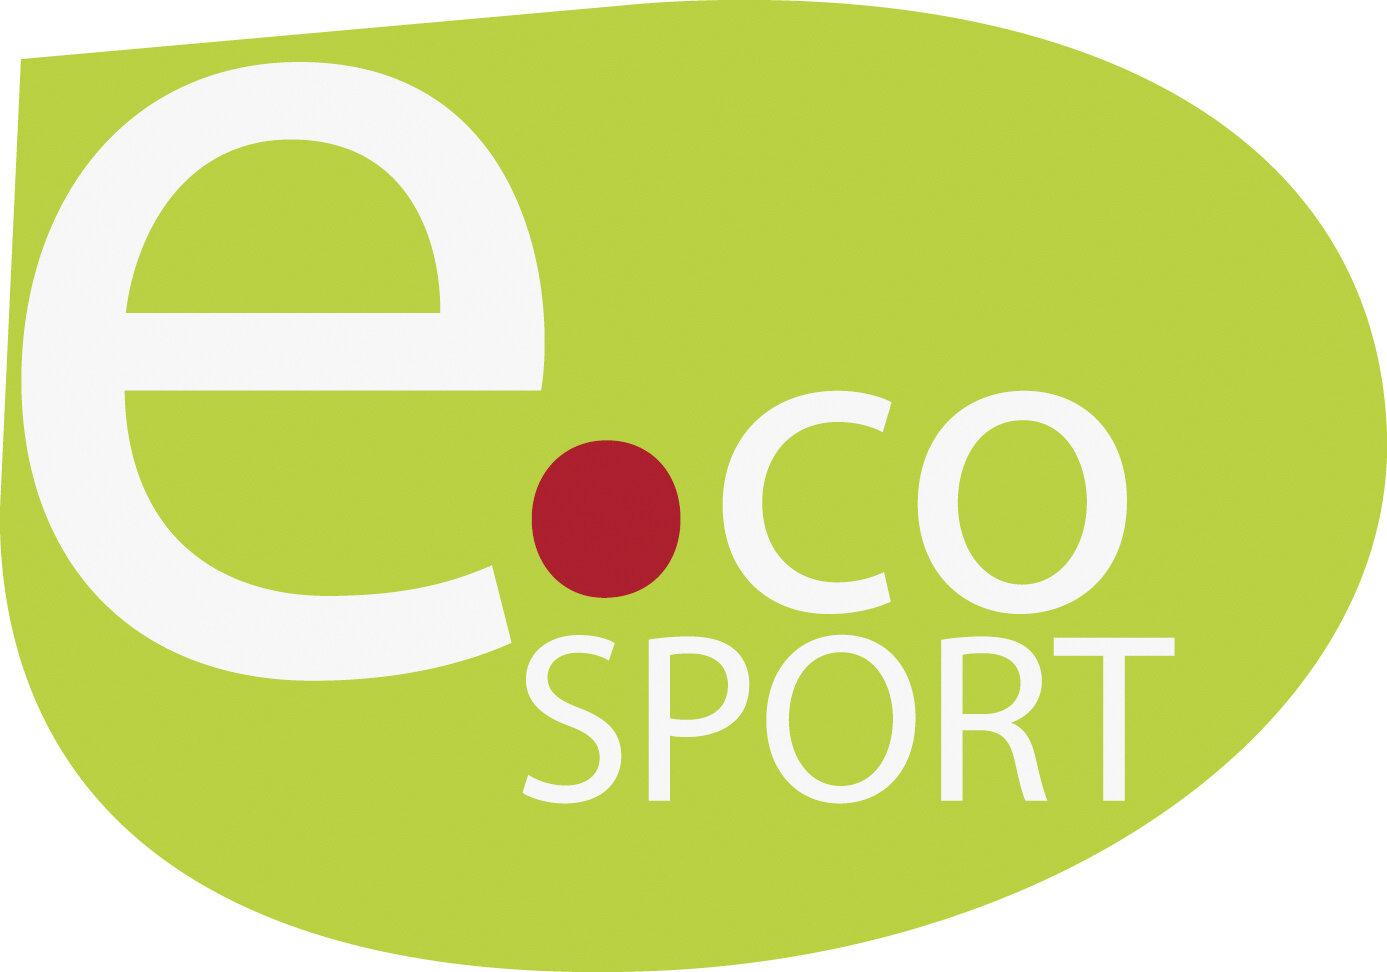 Logo_e.coSport